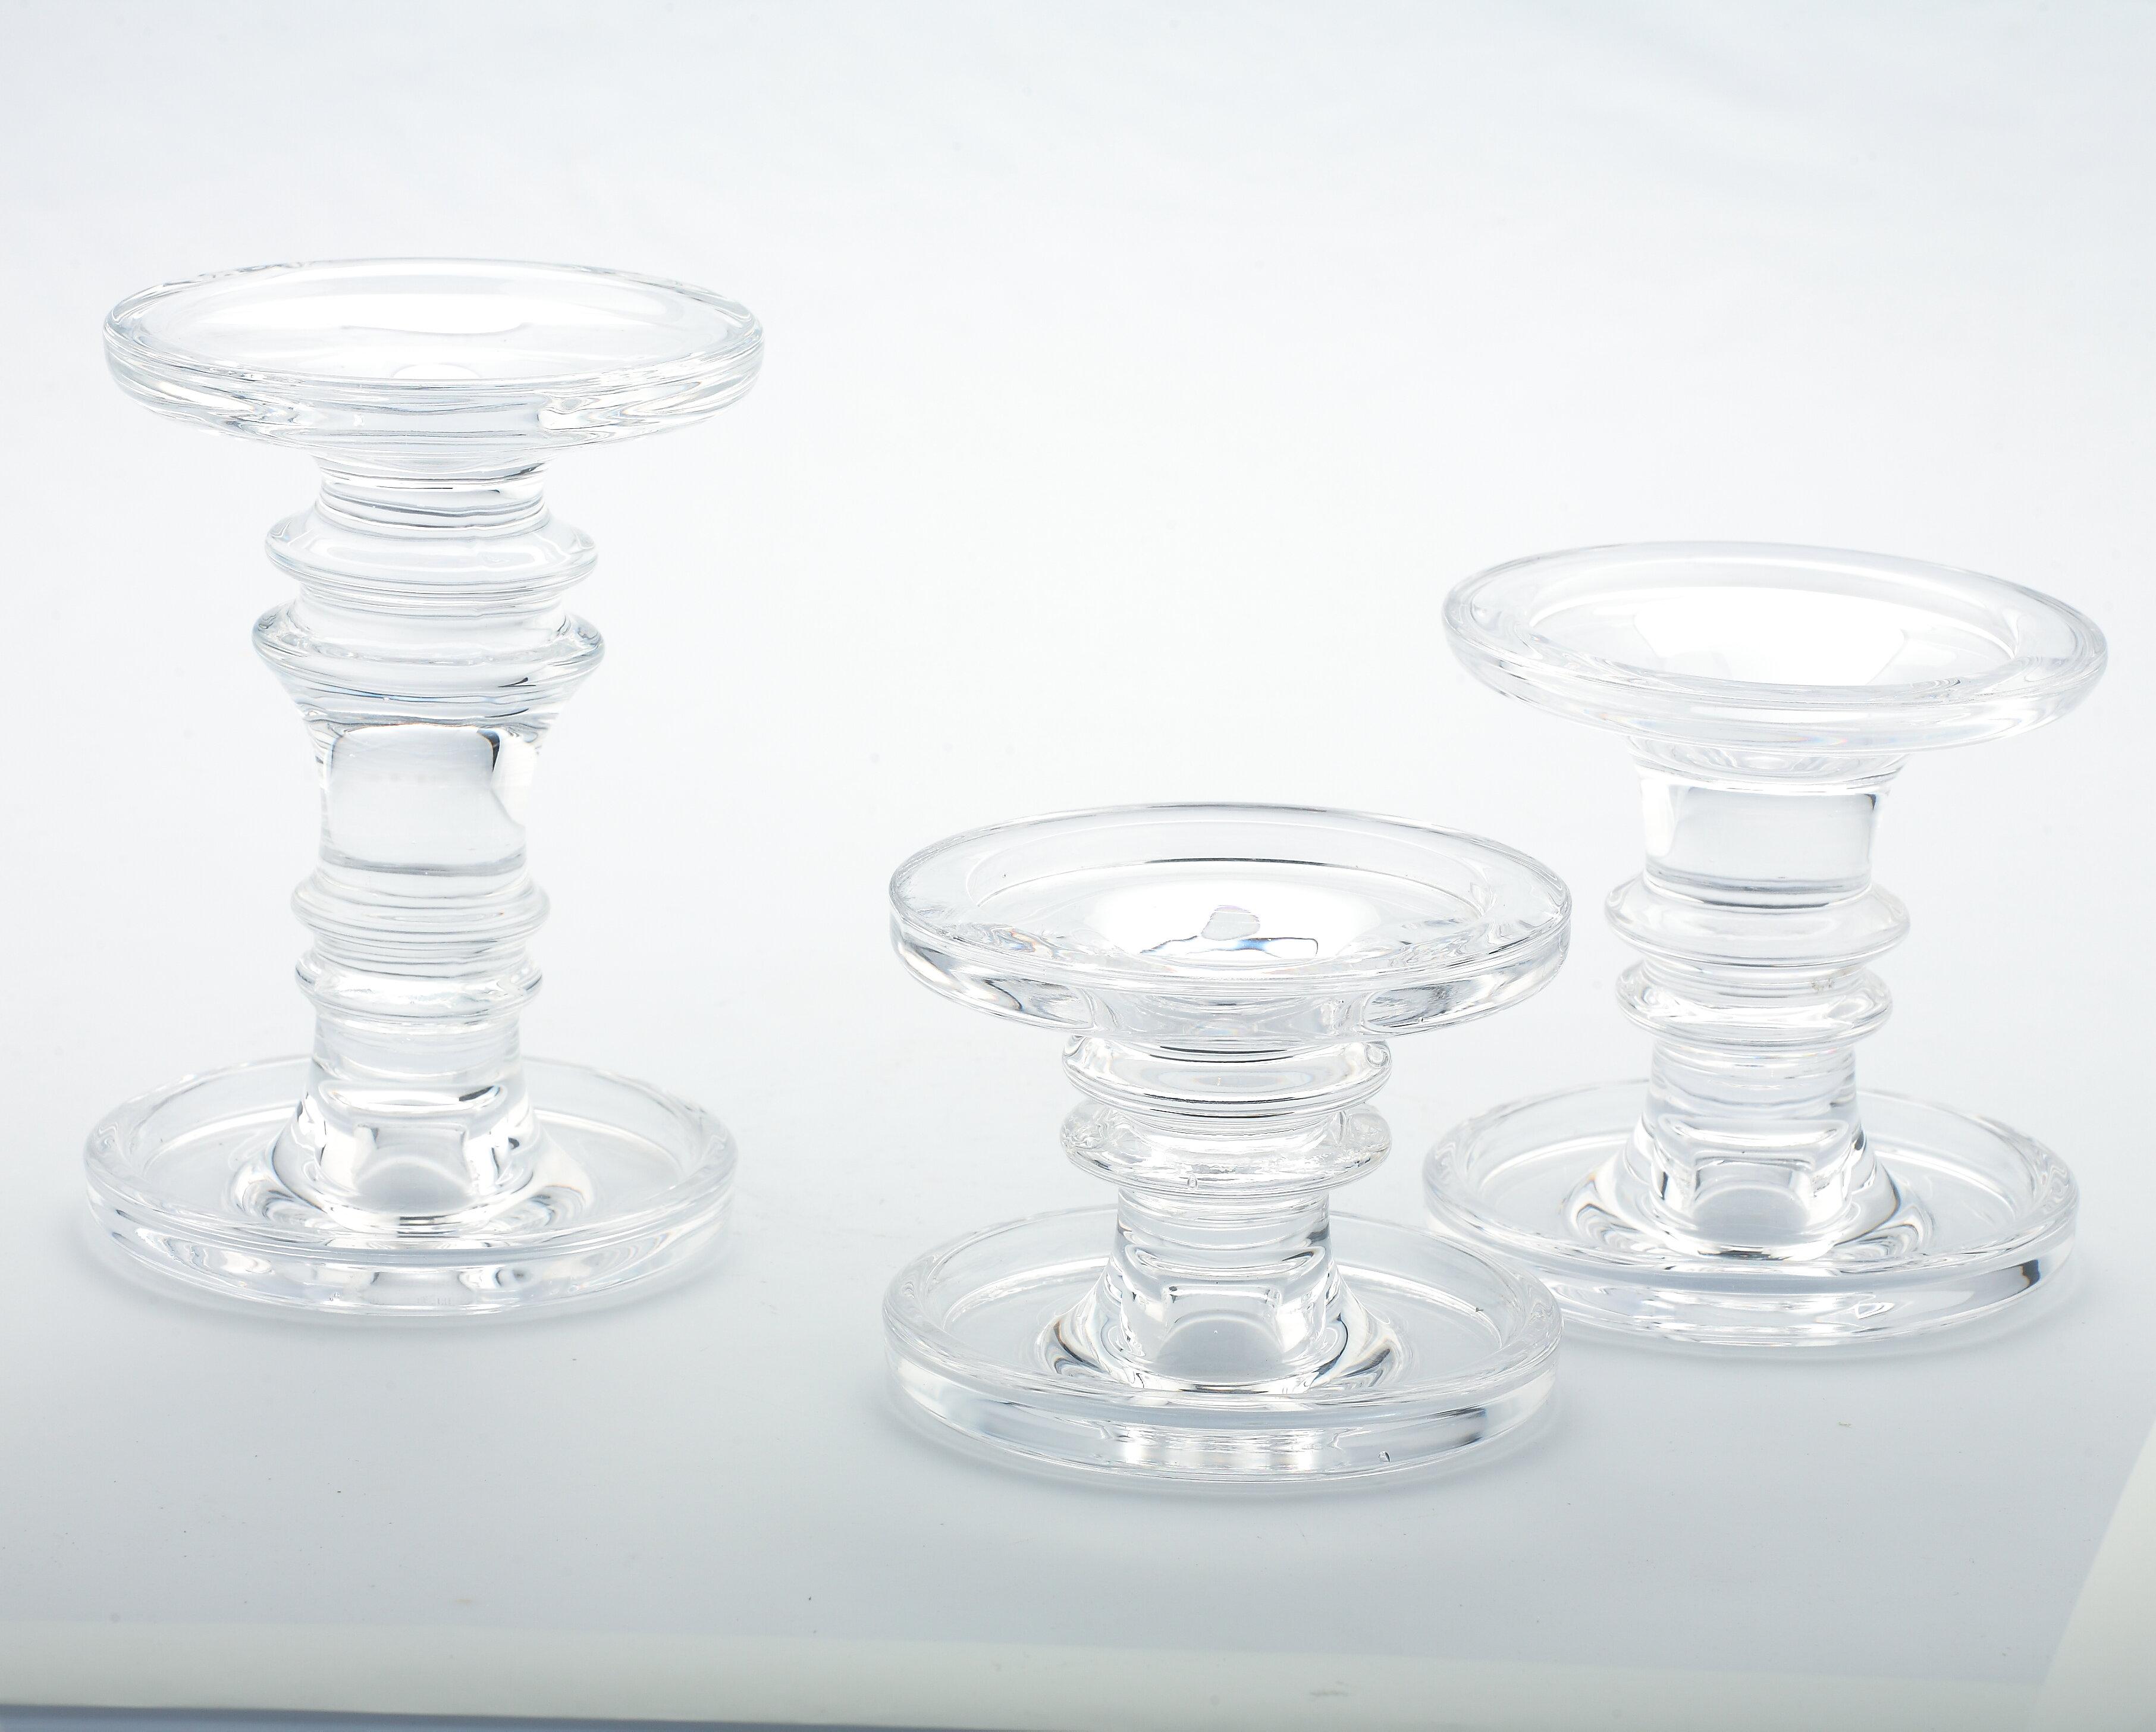 House Of Hampton 3 Piece Small Glass Candlestick Set Reviews Wayfair